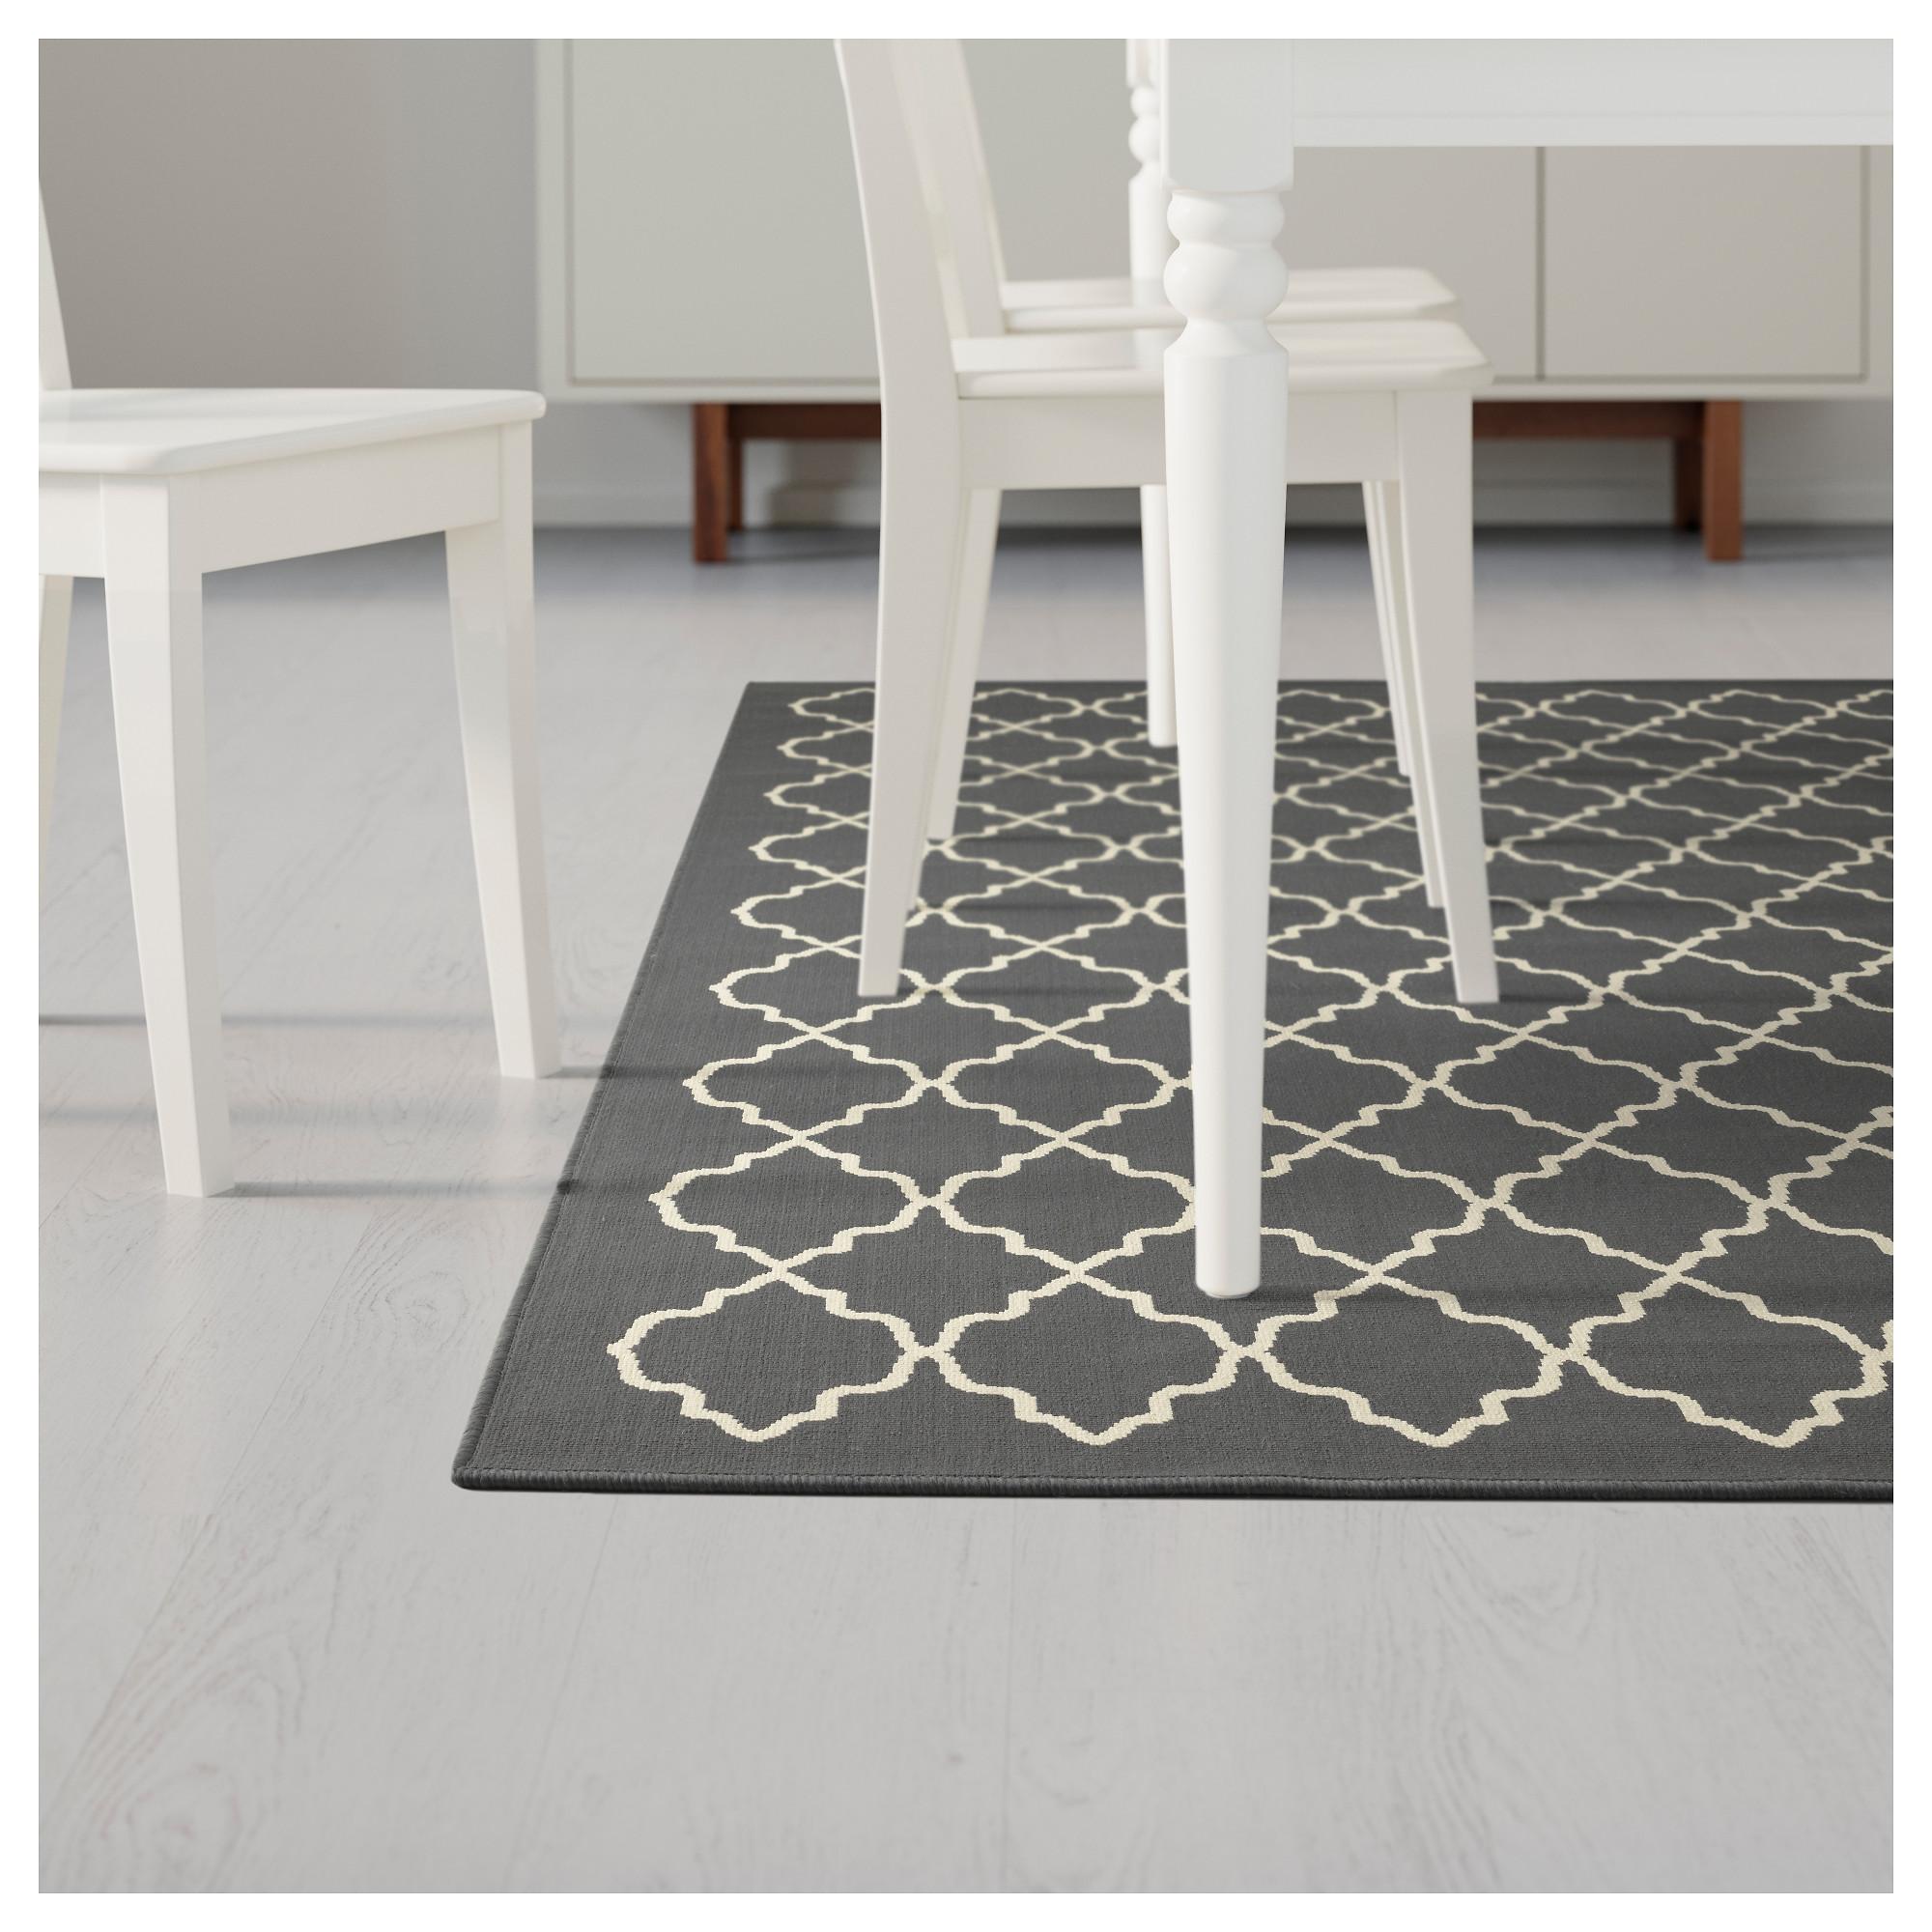 hampen rug, high pile 5 u0027 3 dining room dining room rugs ikea QZNUCIN